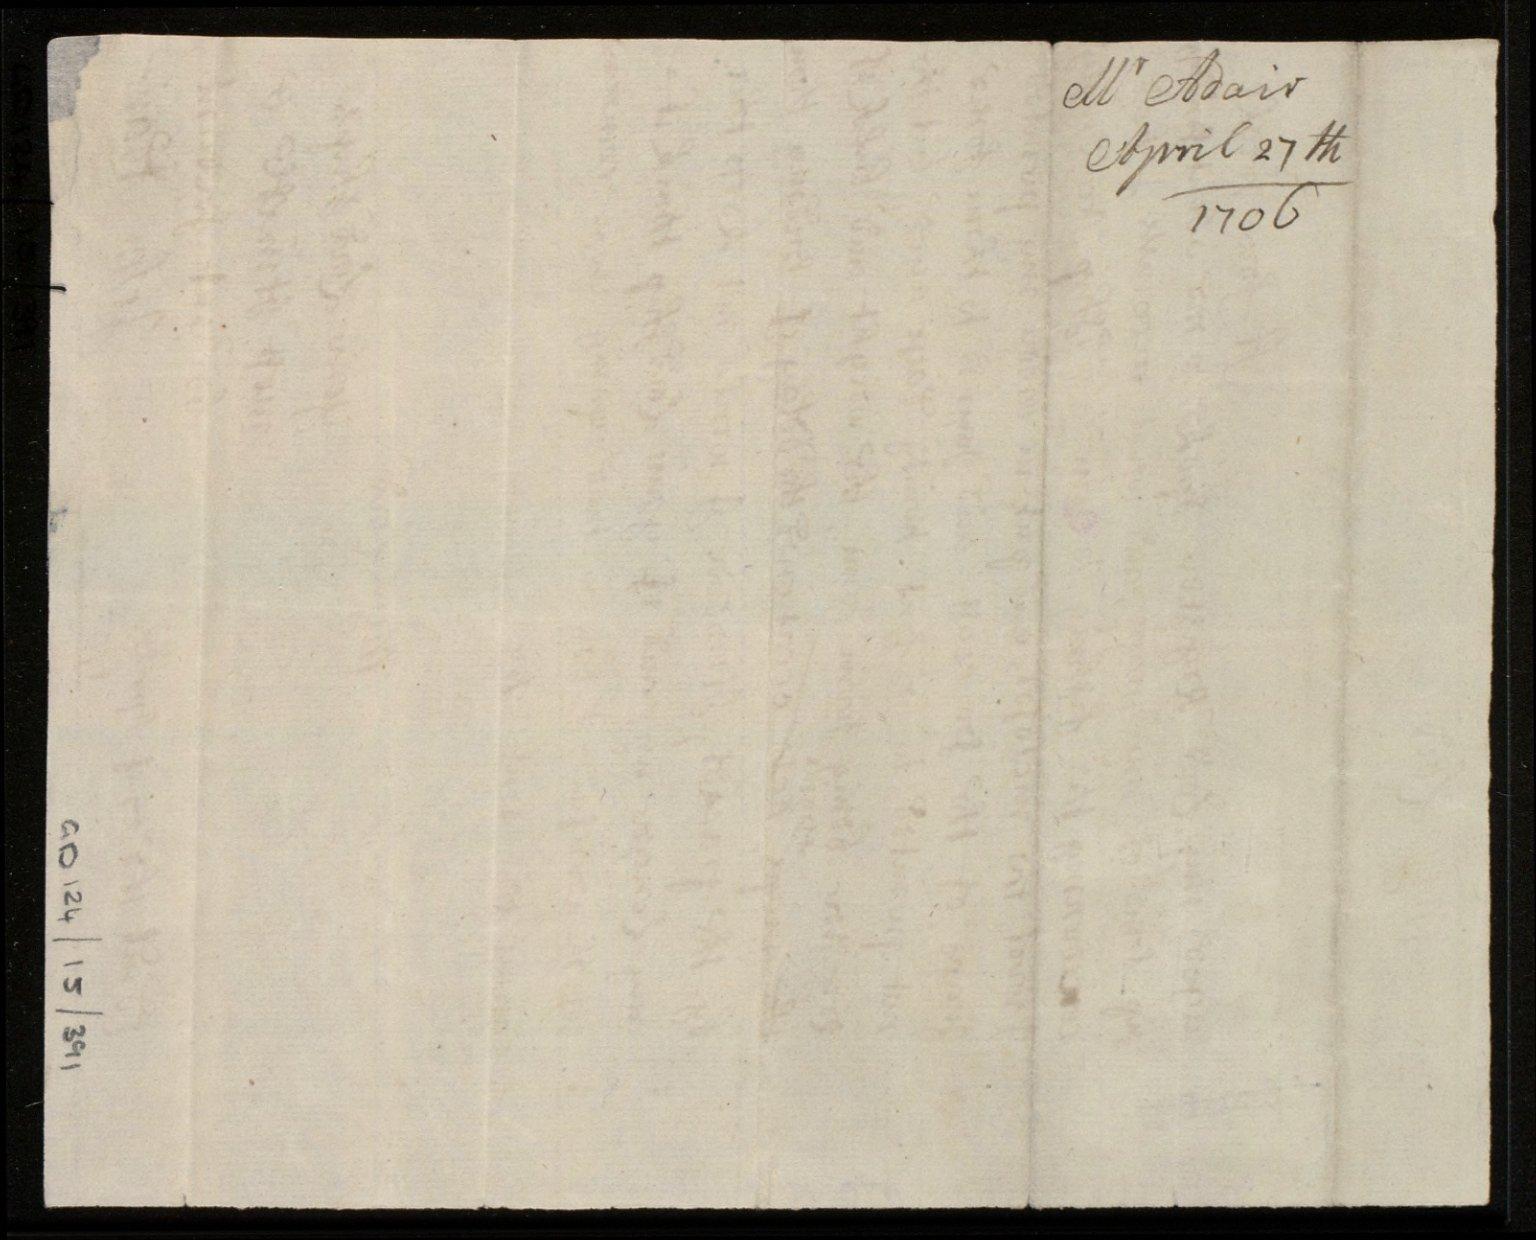 [Letter from John Adair, Edinburgh, to the Earl of Mar regarding Mar's request for Adair's maps] [2 of 2]